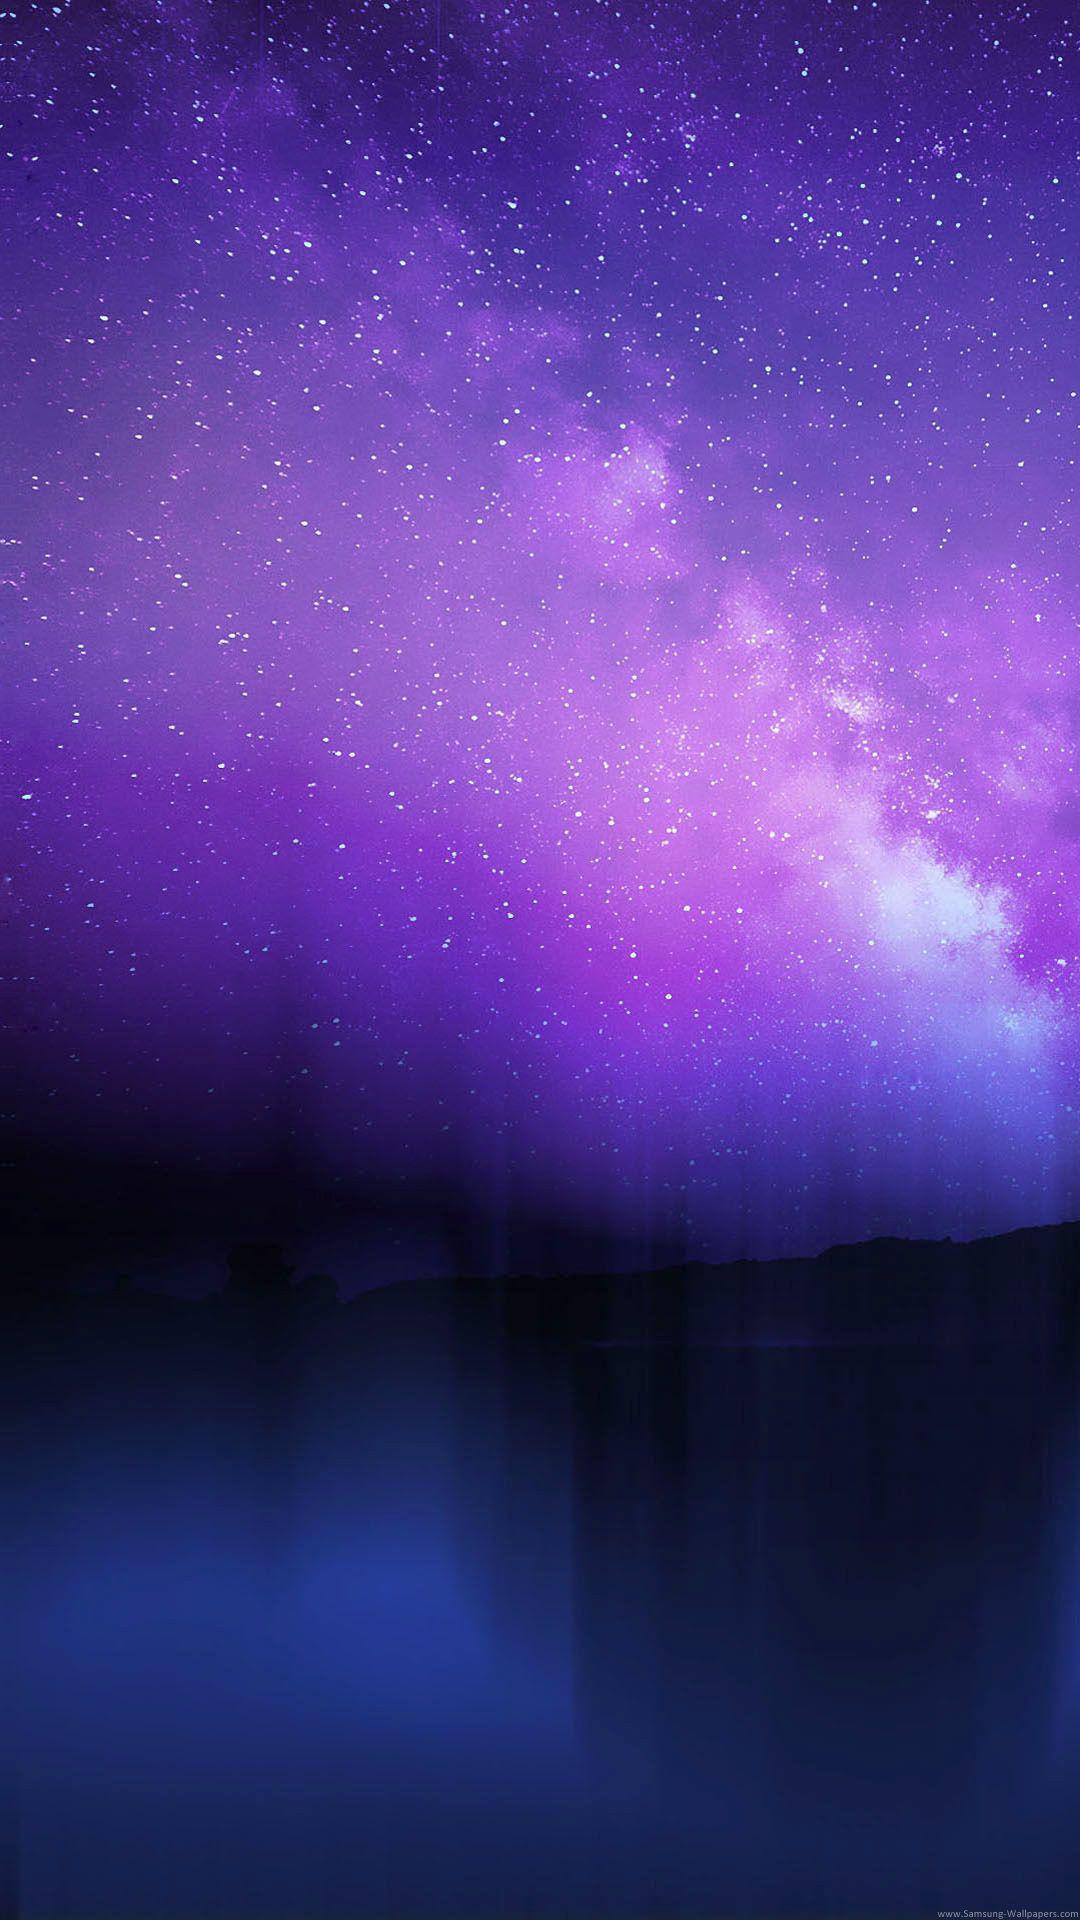 Fantasy Star Hd In 2020 Cool Wallpapers For Phones Galaxies Wallpaper Stock Wallpaper